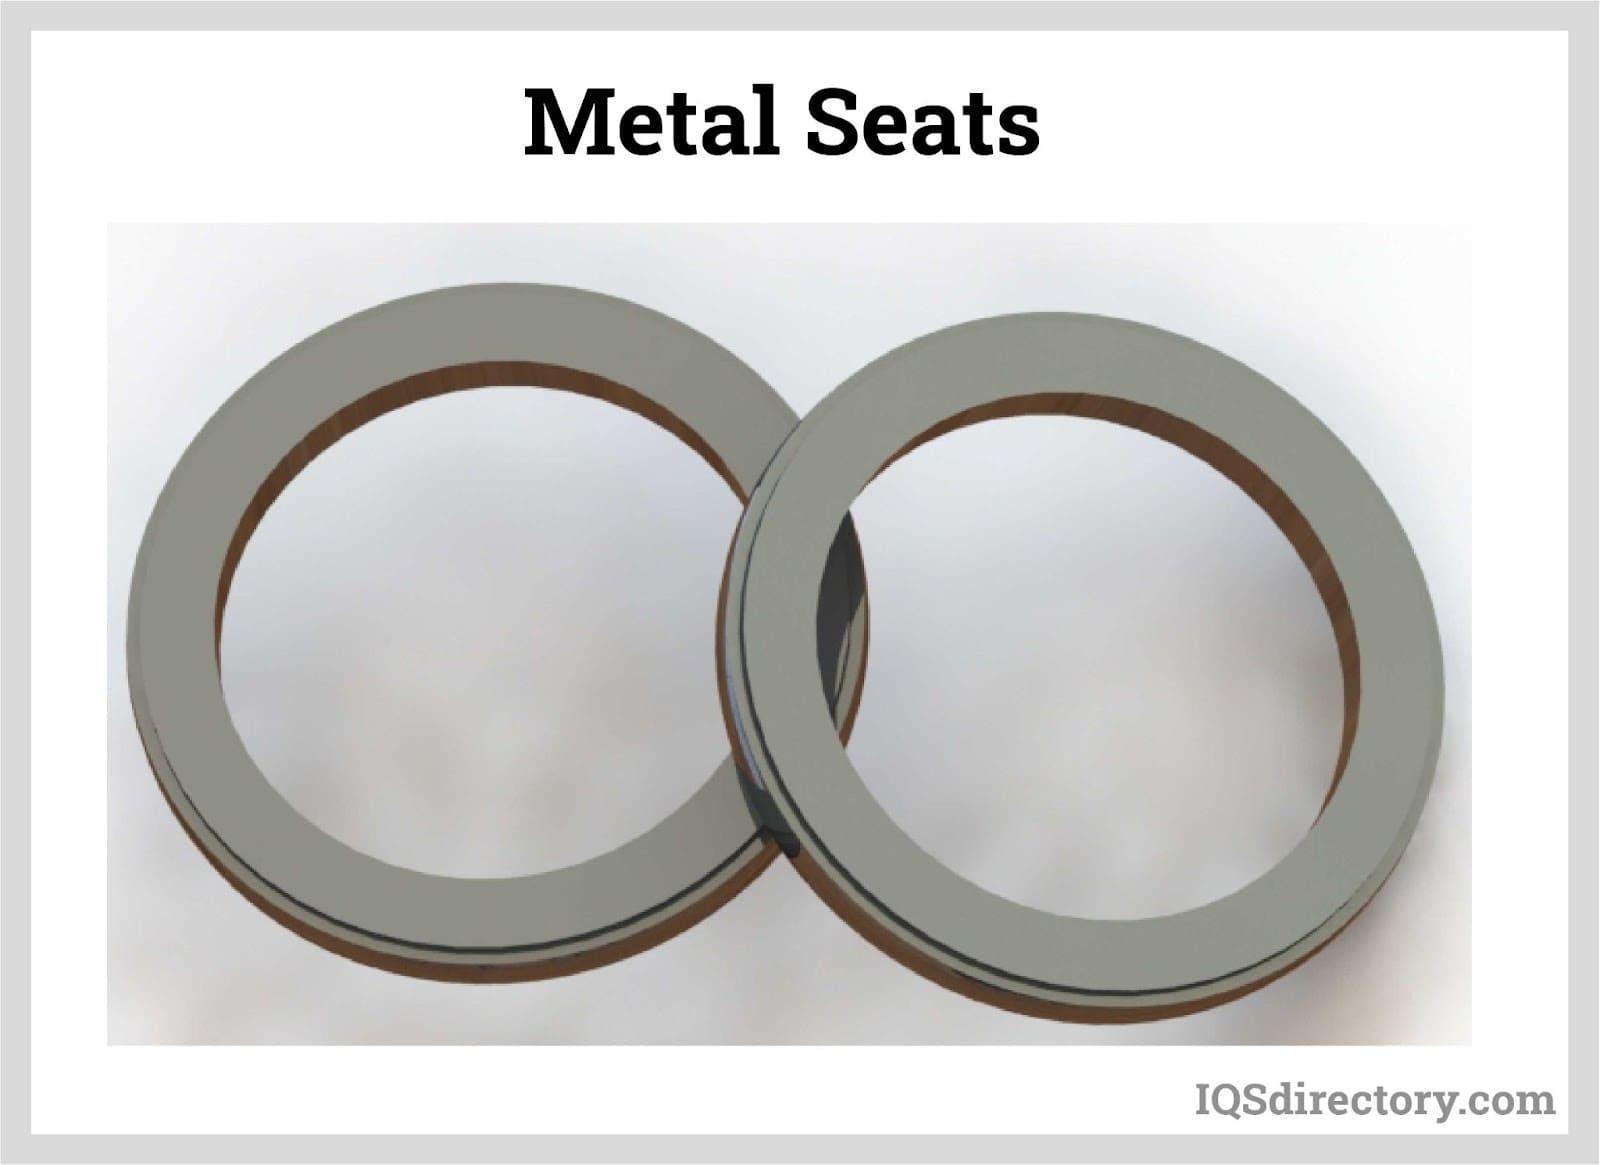 Metal Seats